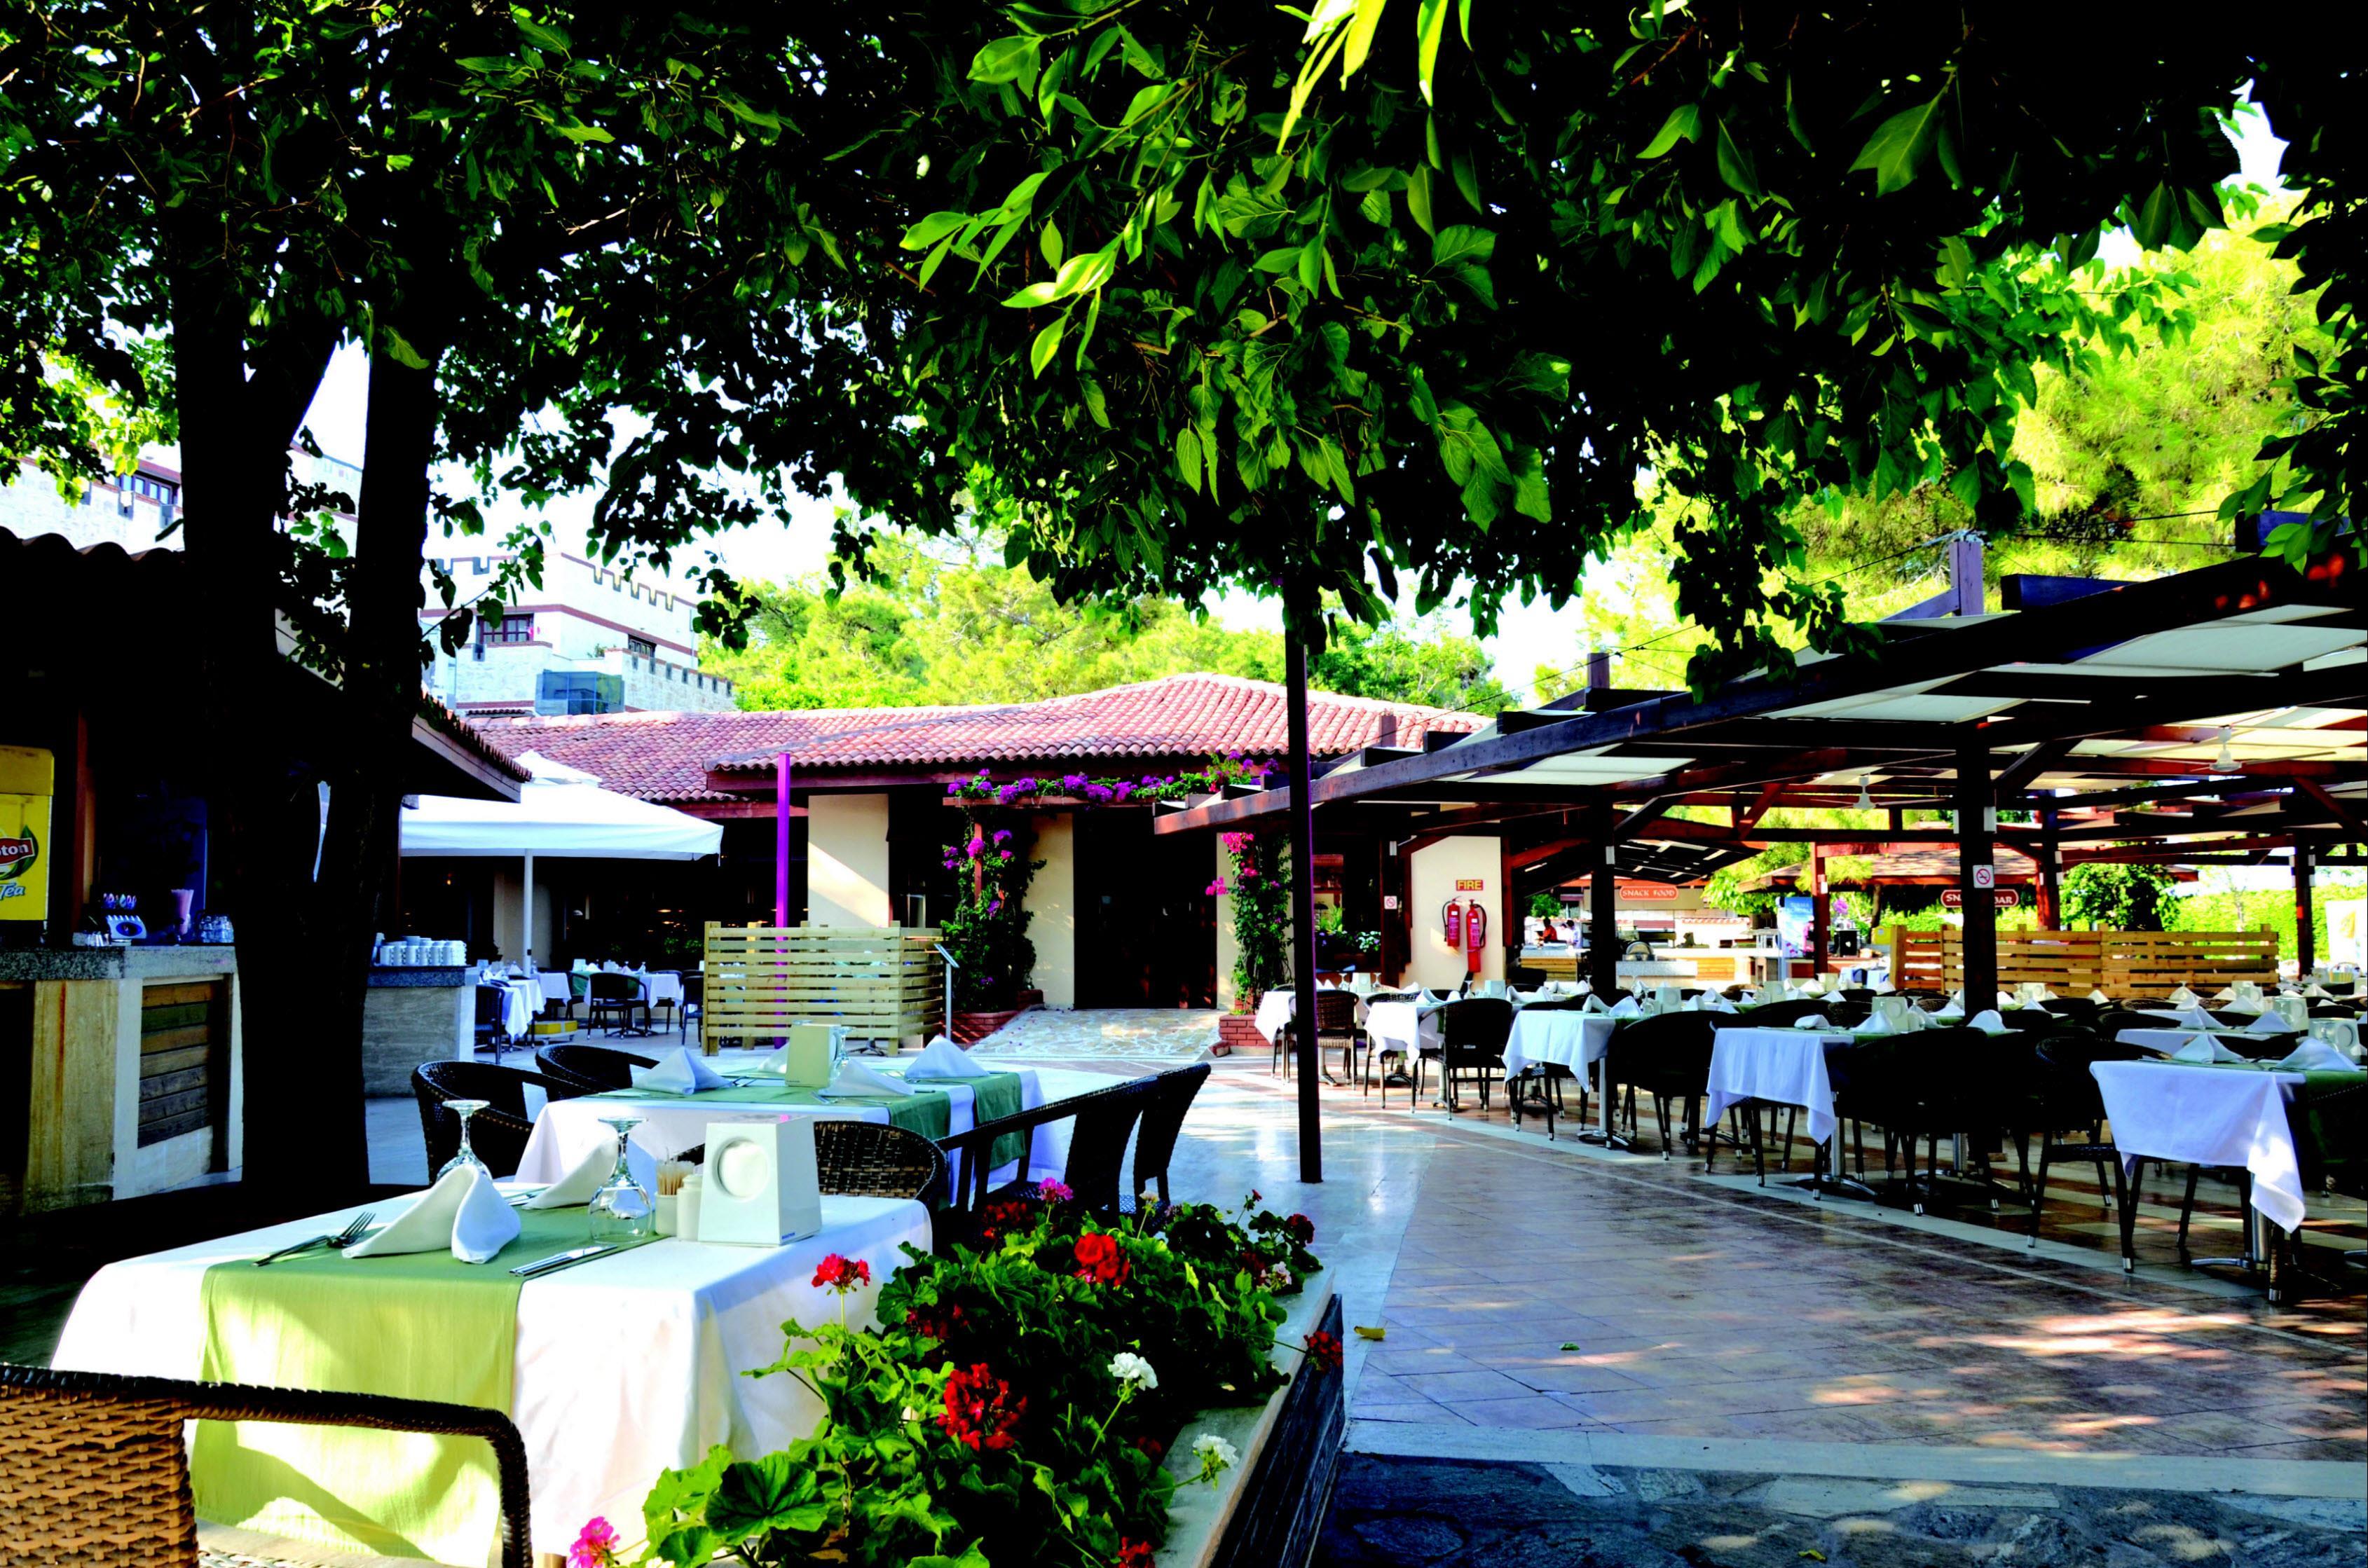 http://www.orextravel.sk/OREX/hotelphotos/ulusoy-kemer-holiday-club-area-0031.jpg